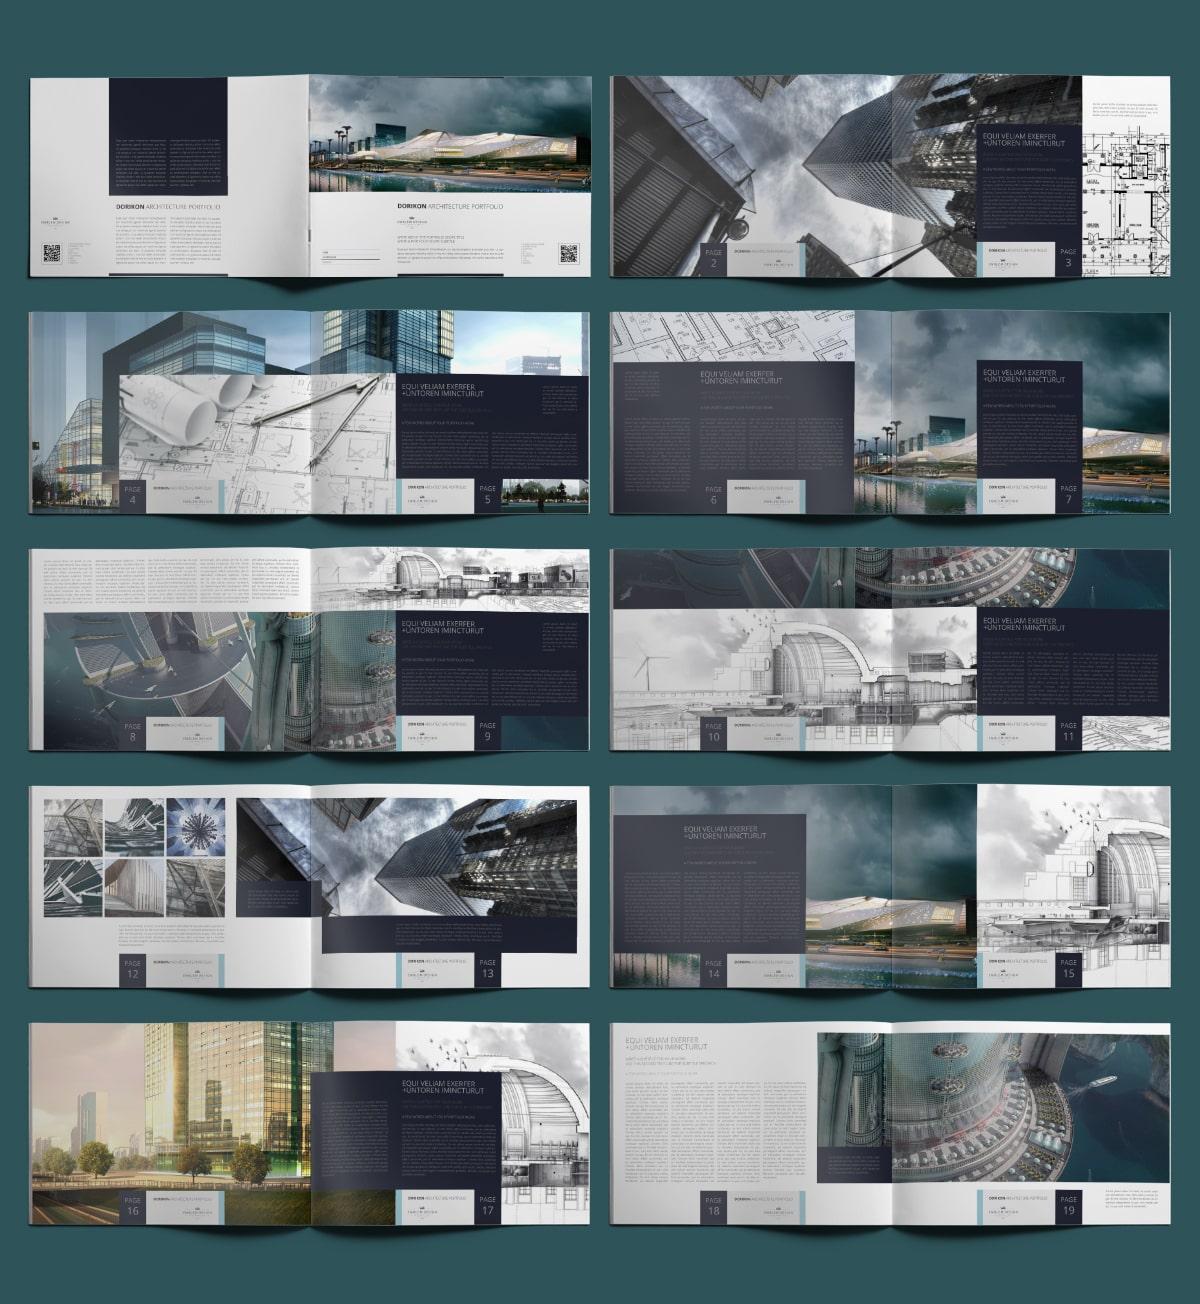 Dorikon Architecture Portfolio A4 Landscape - Layouts